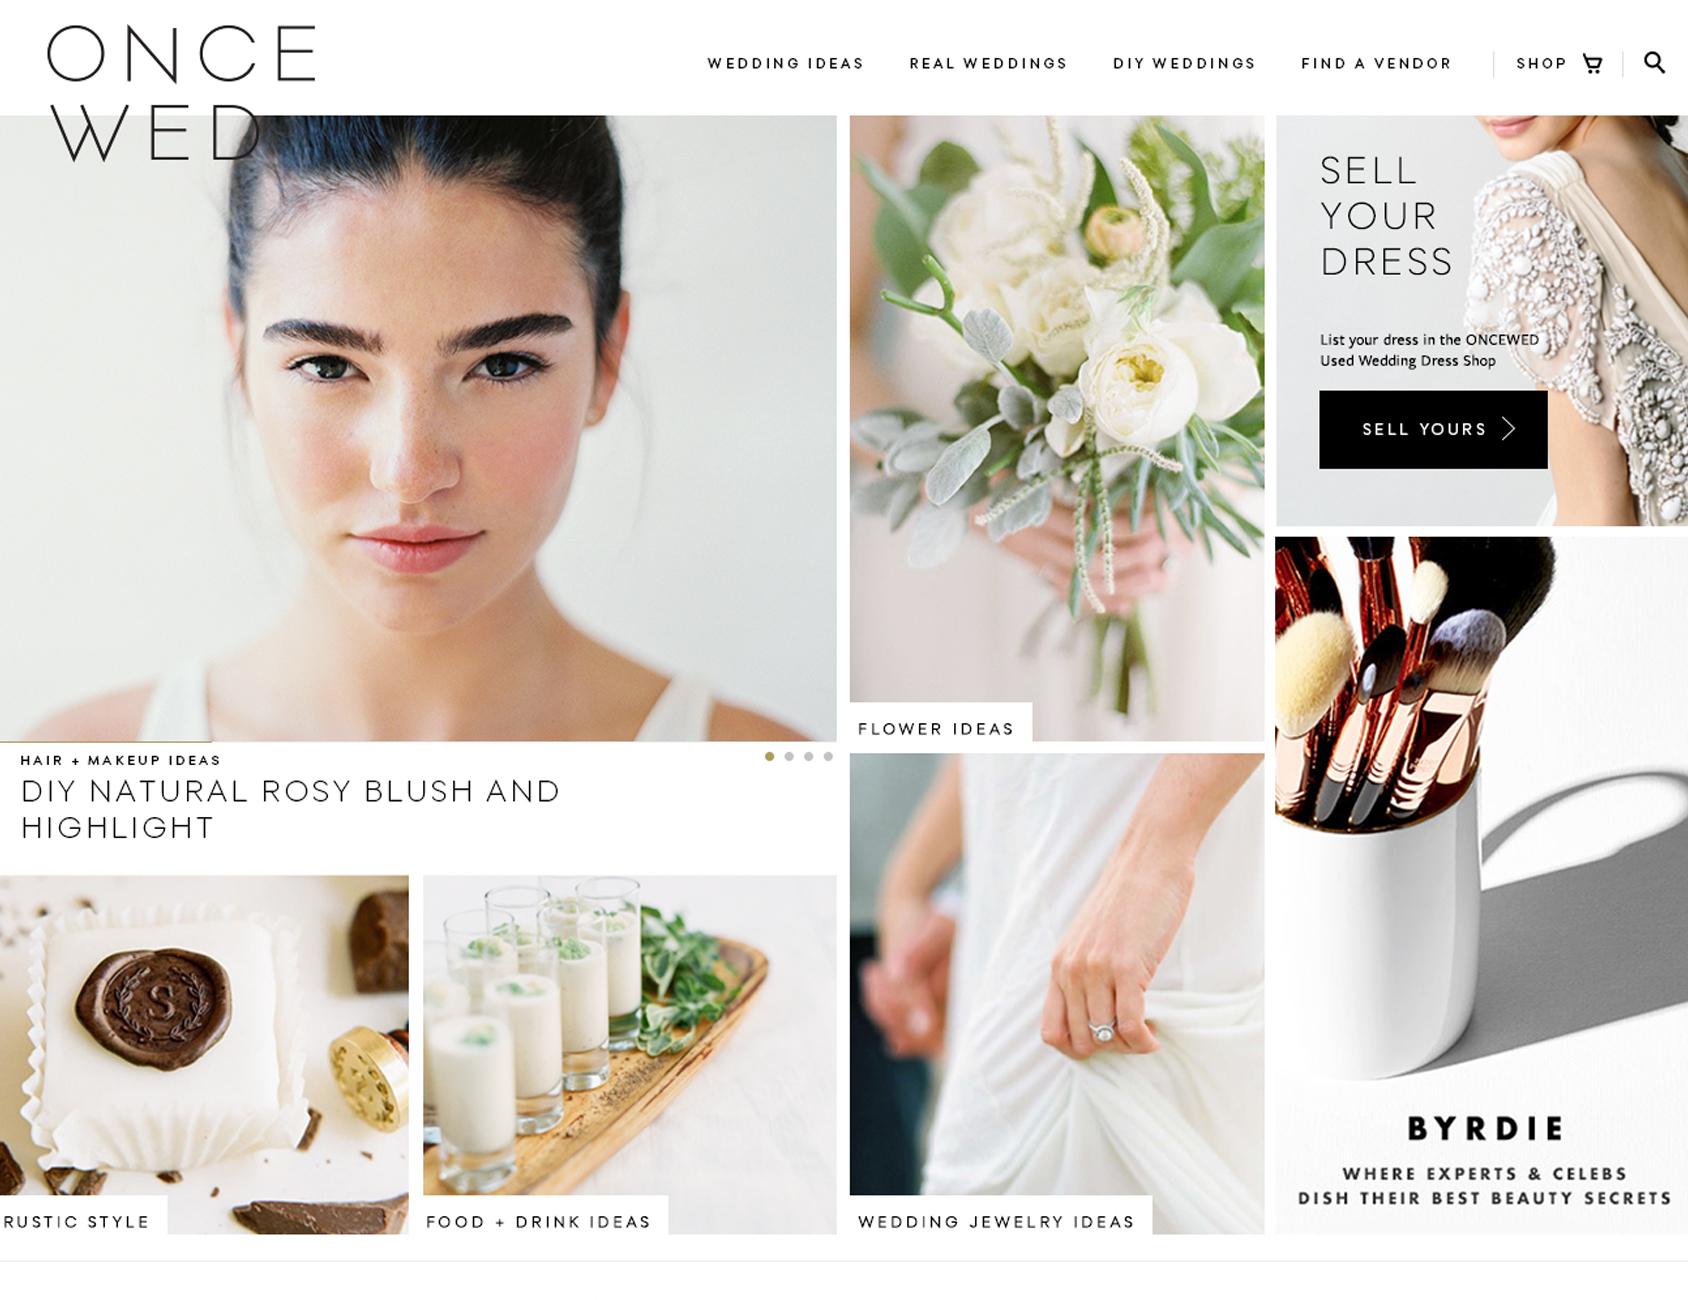 Julia-Kostreva-Studio--oncewed--Wordpress-website.jpg